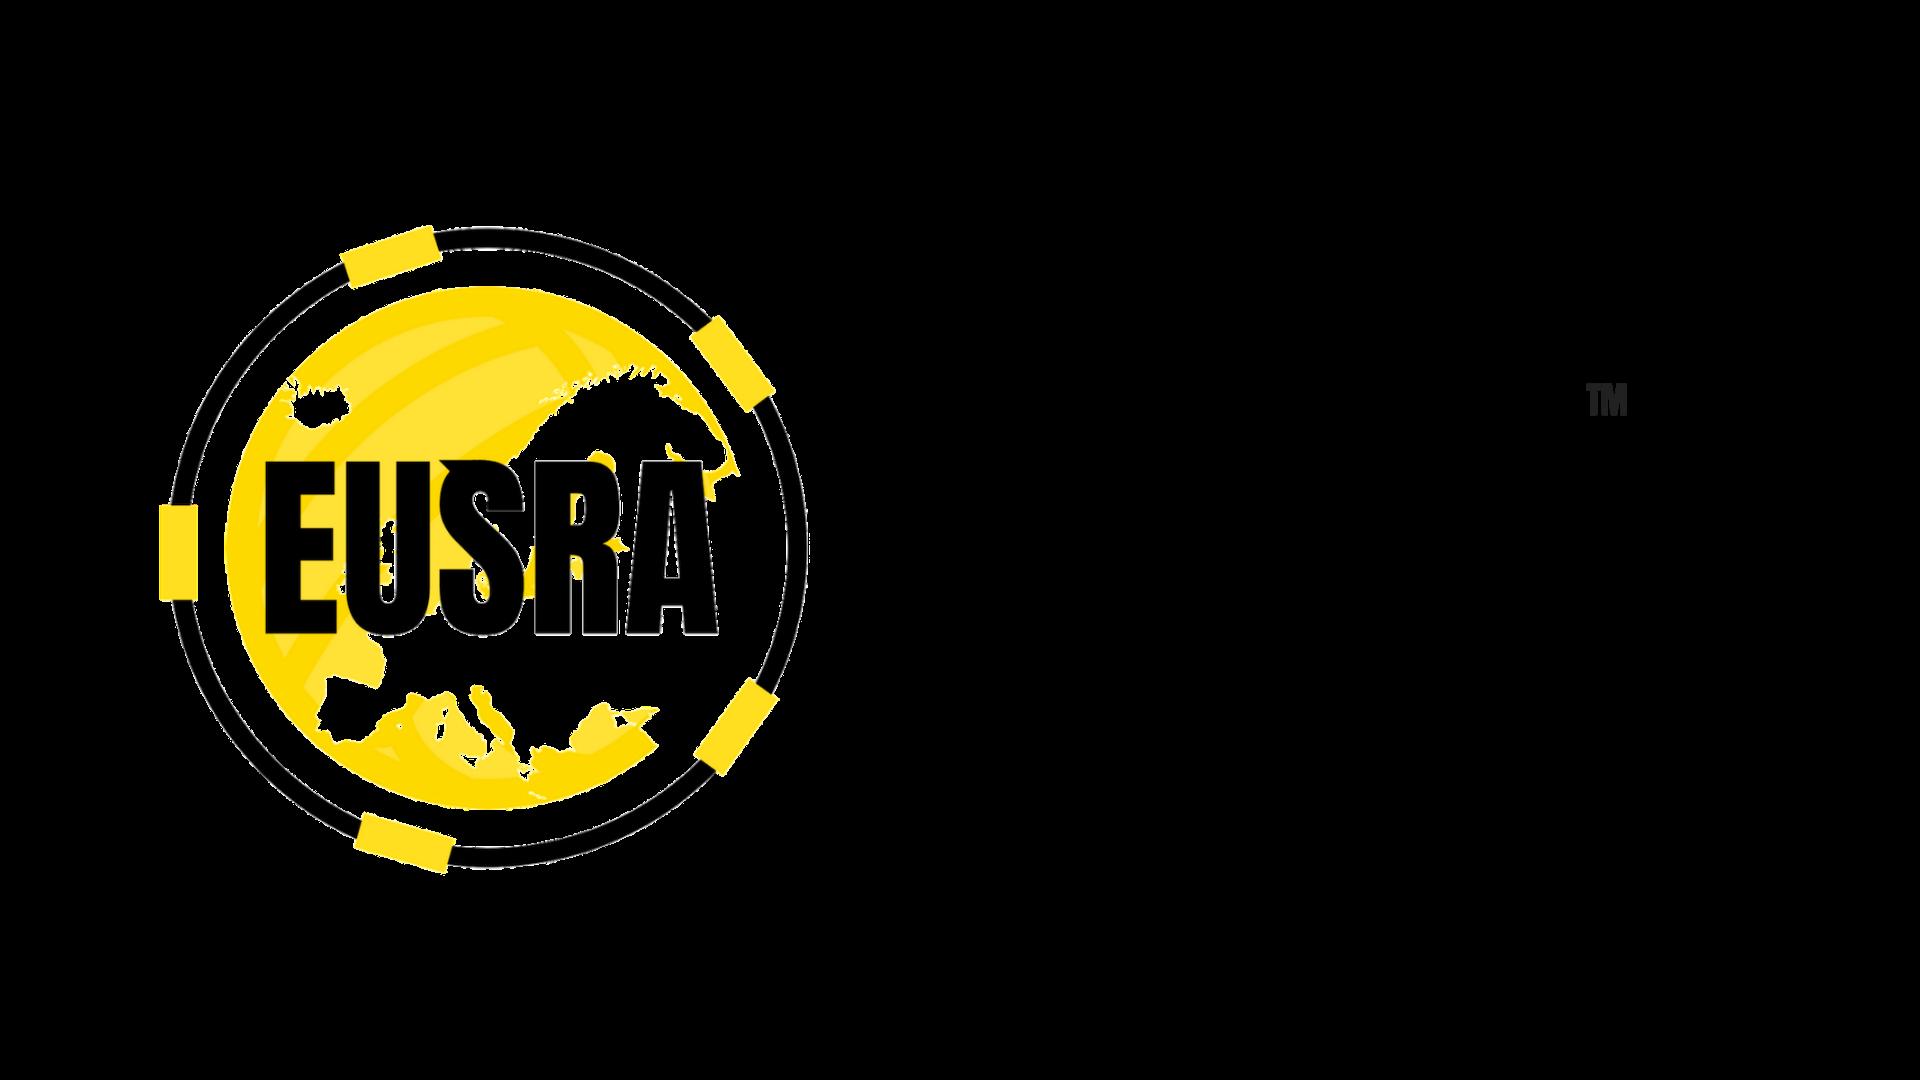 http://asociace.roundnet.cz/wp-content/uploads/2019/12/Copy-of-Copy-of-EUSRA-logo-BIG-ONE-4.png